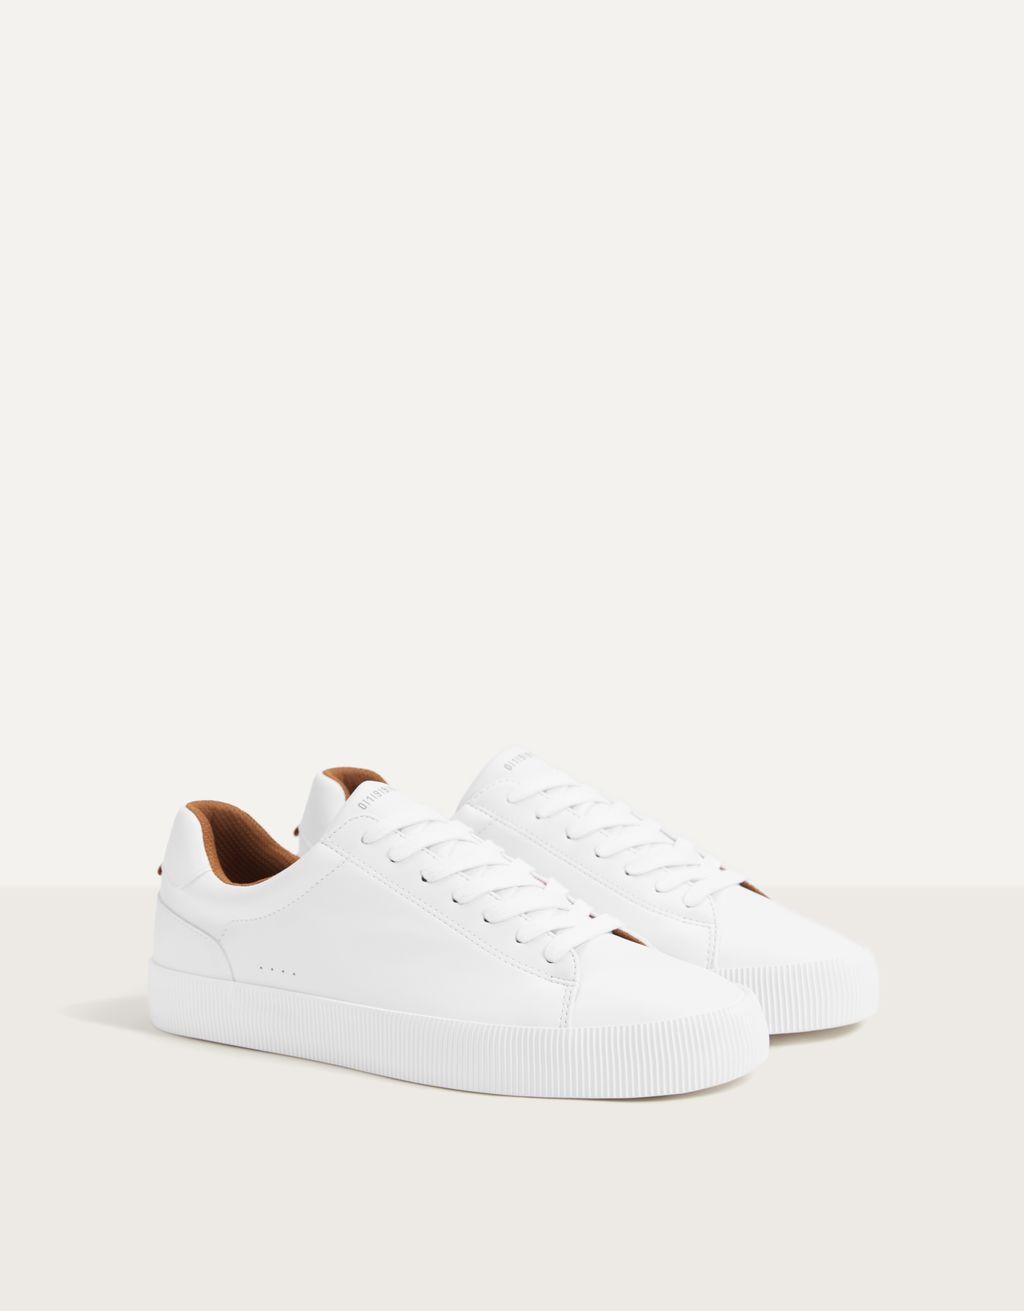 Men's white trainers